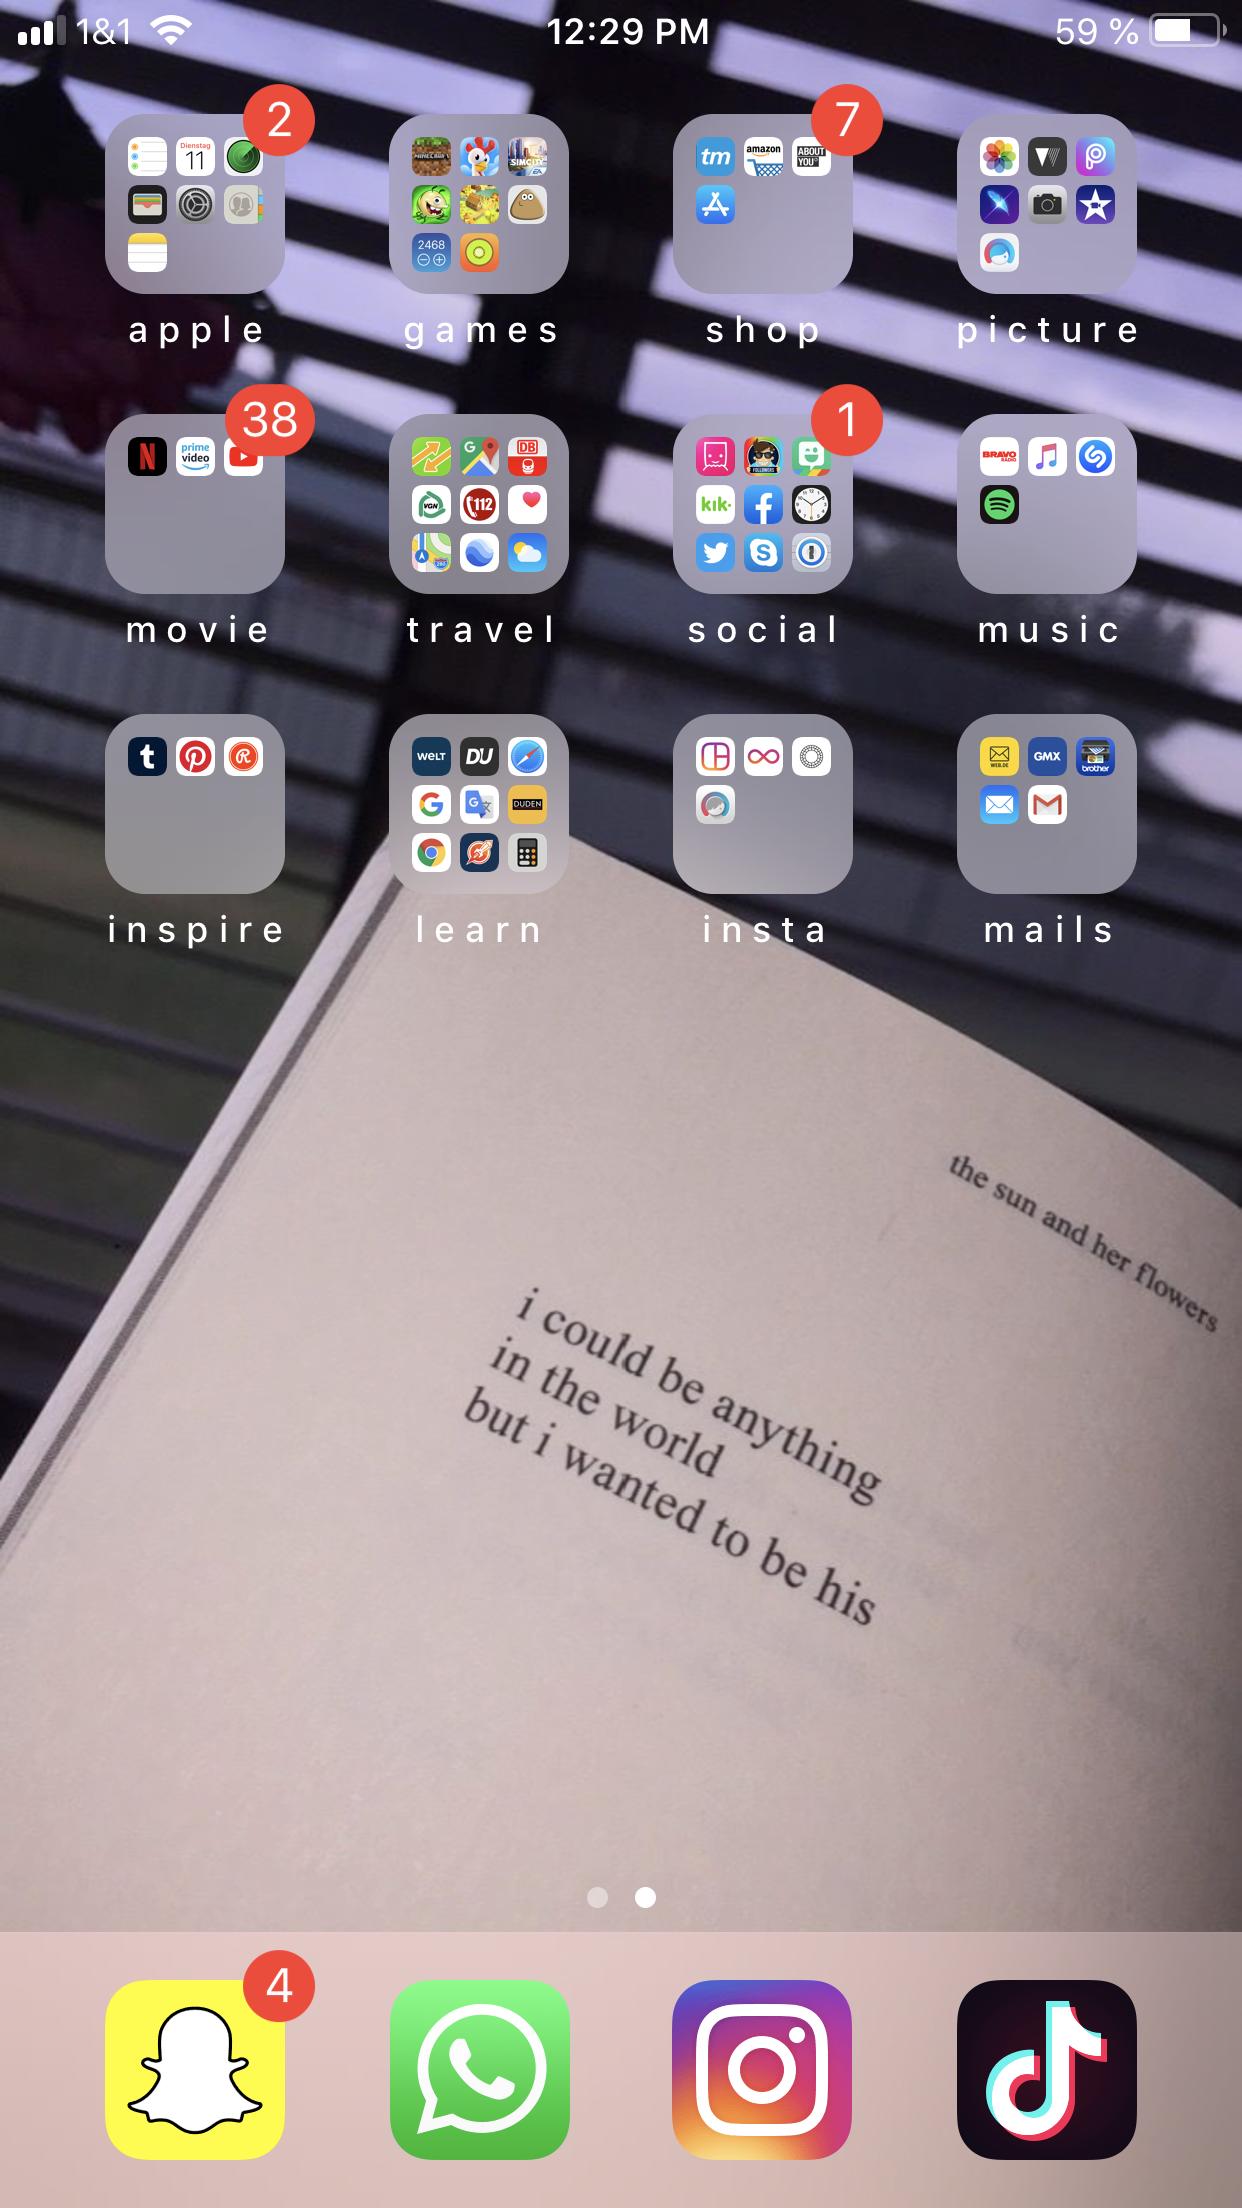 Homebildschirm Phone Apps Iphone Iphone Organization Organize Phone Apps